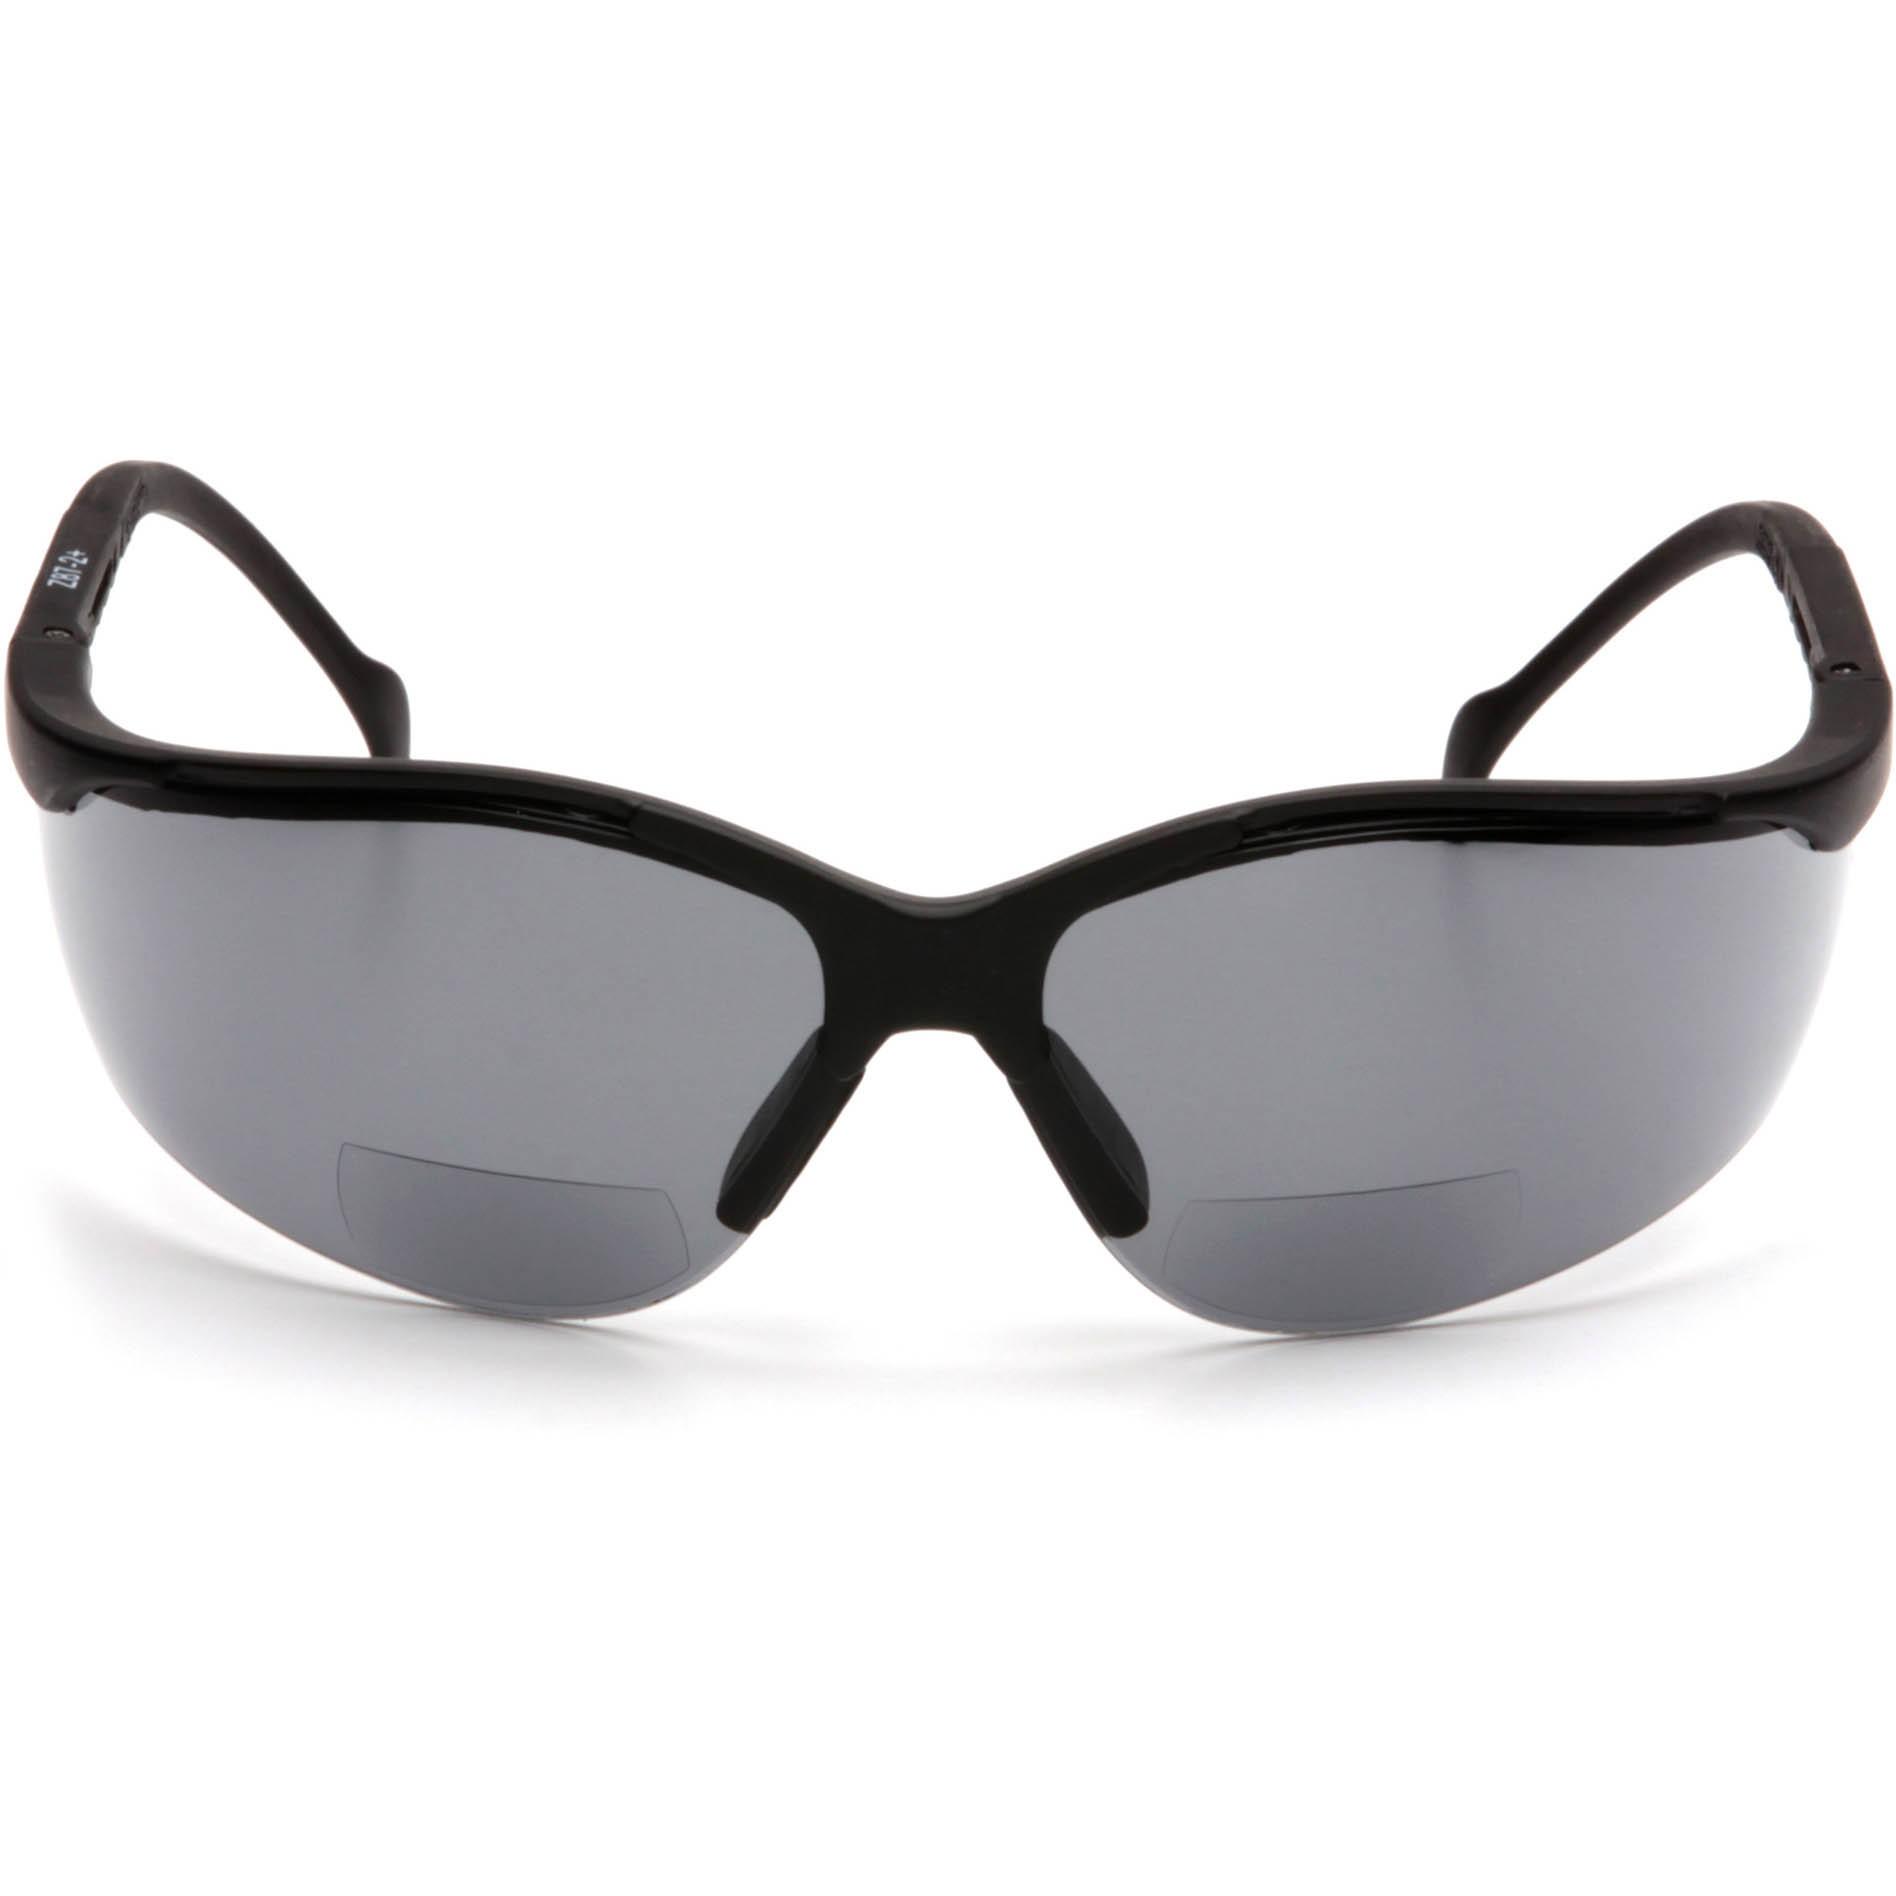 eaa3f202ac0c ... www.lesbauxdeprovence. Pyramex SB1820R Venture II Readers Safety Glasses  - Black Frame - Gray Bifocal Lens